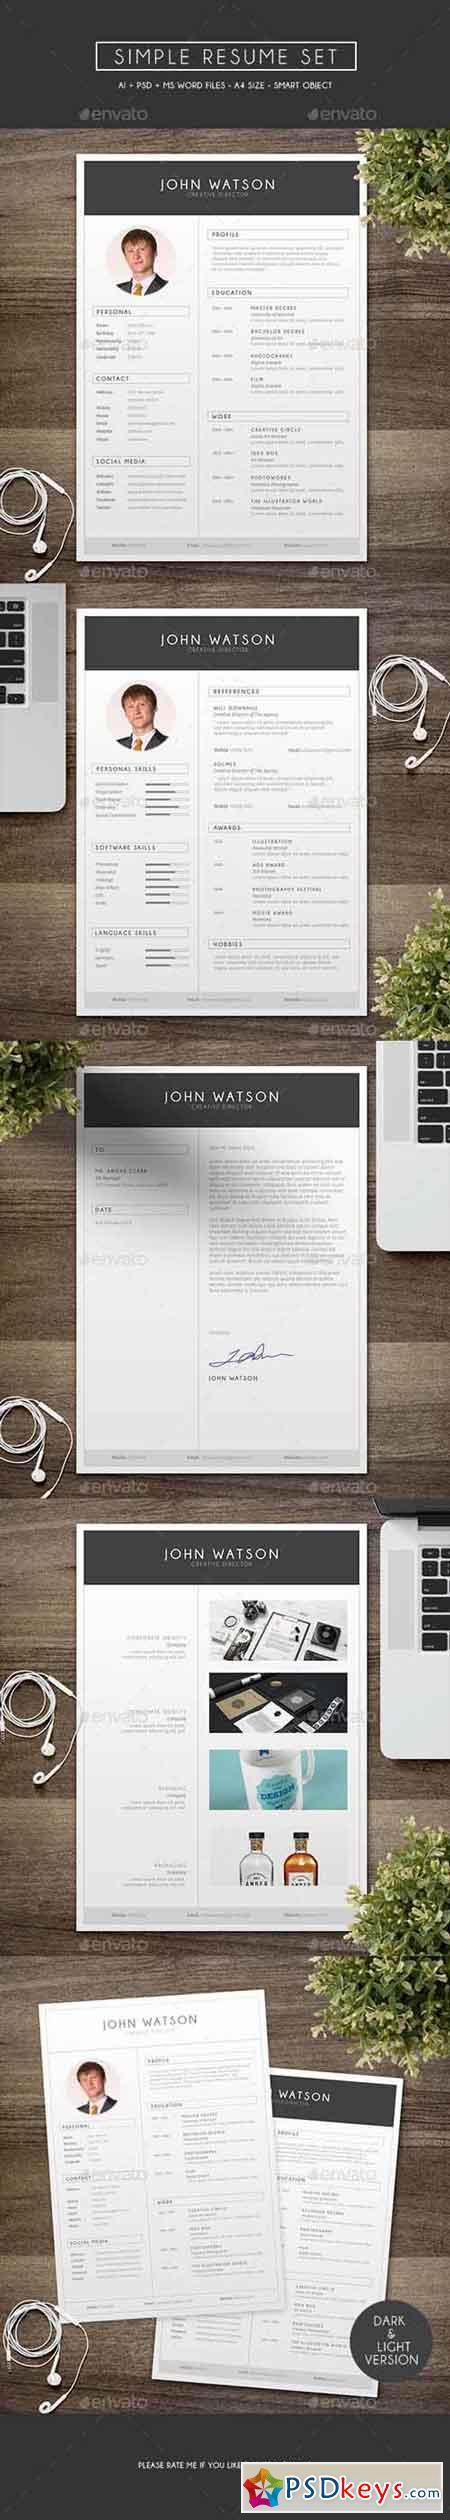 simple resume set 13607824  u00bb free download photoshop